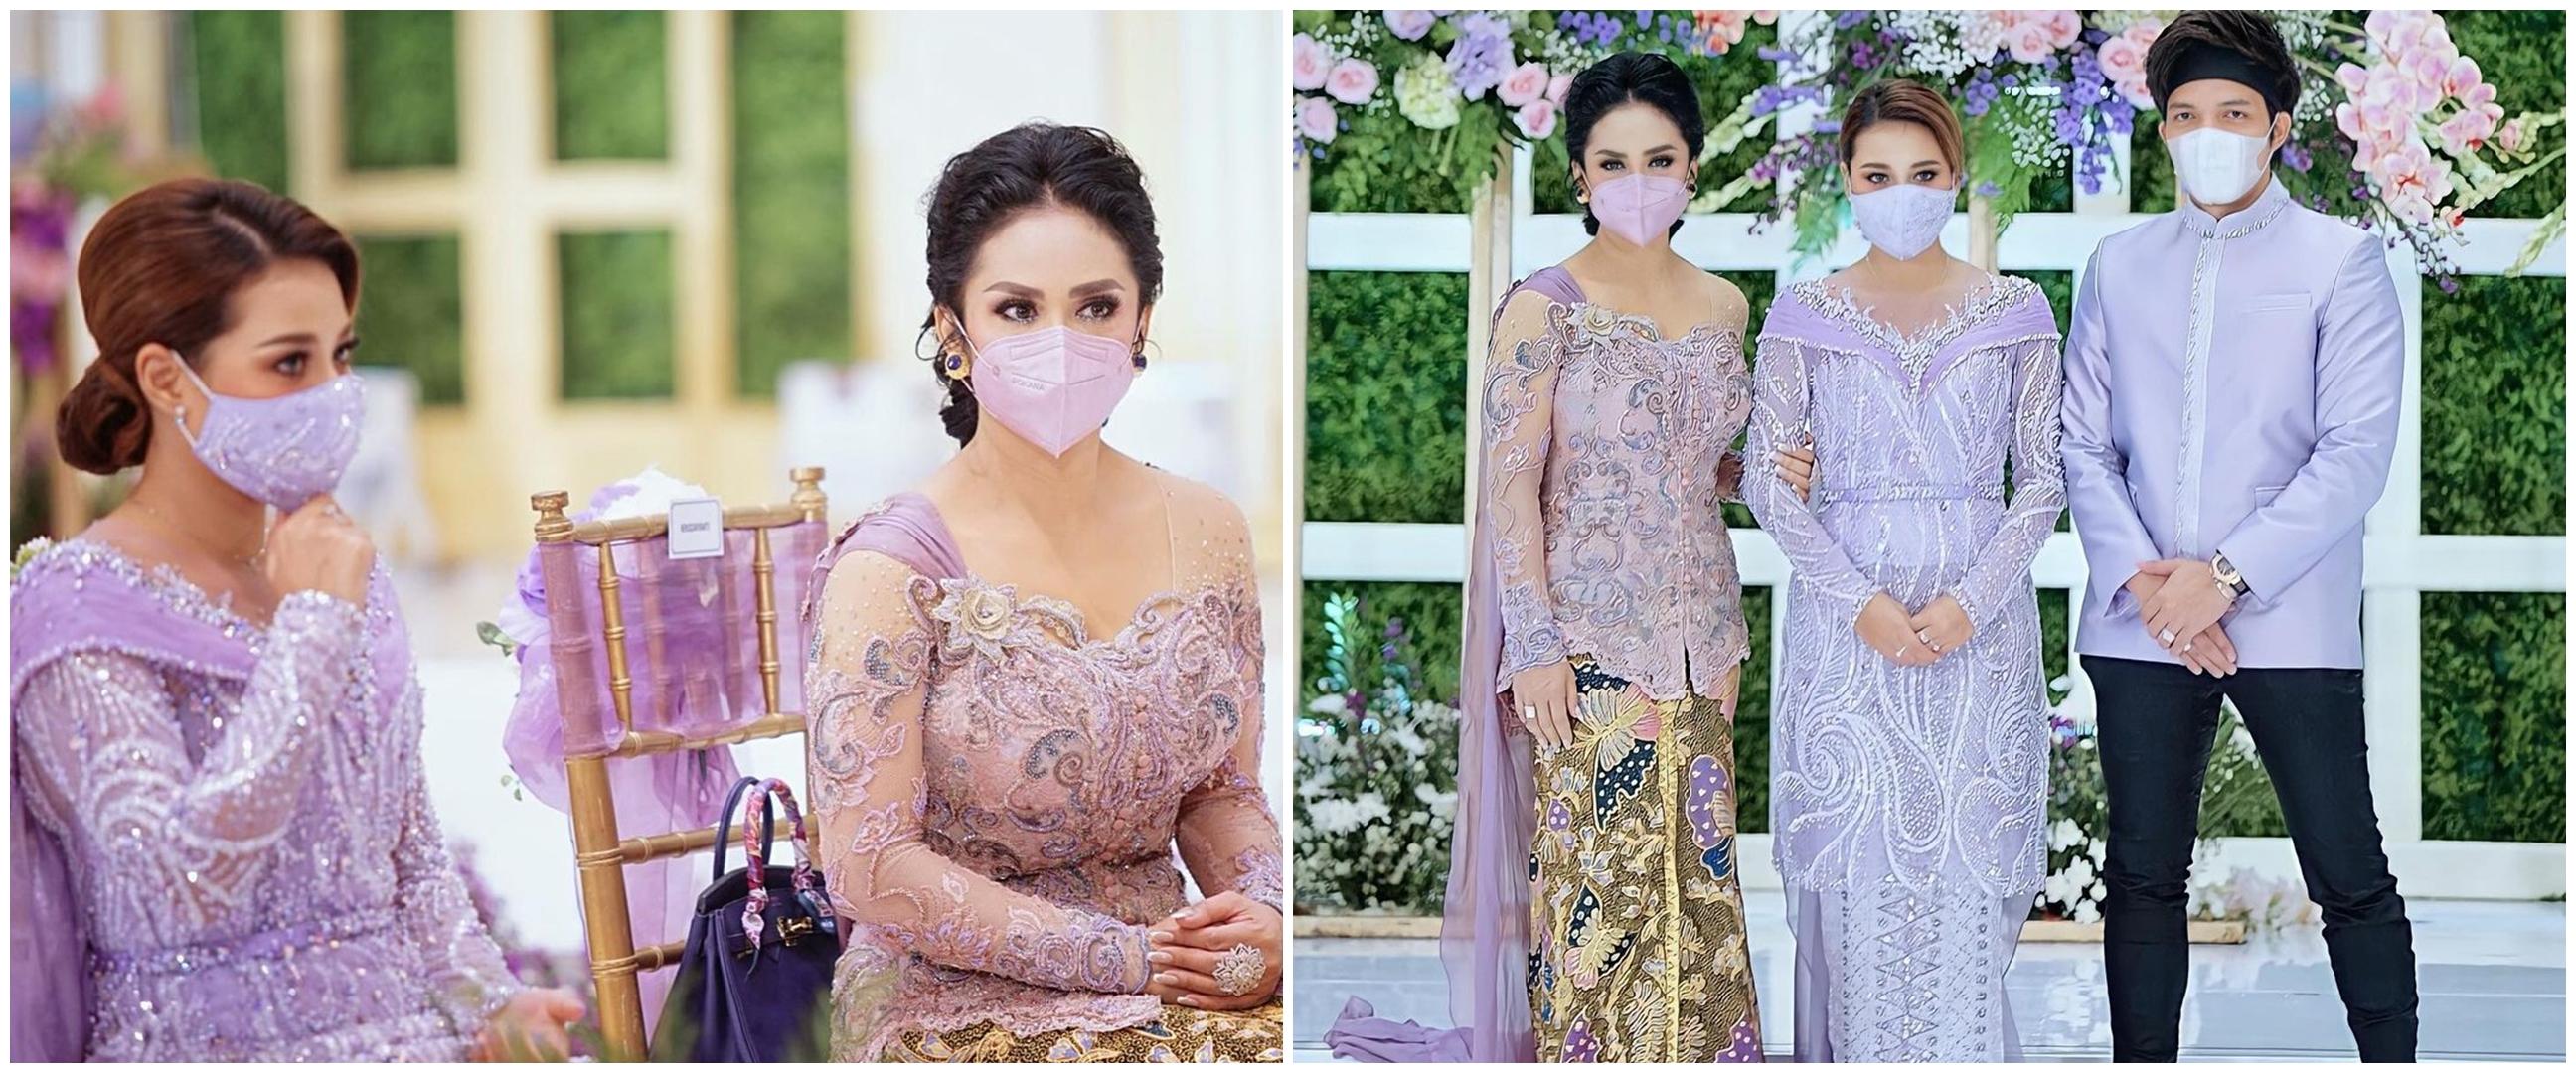 Aurel Hermansyah segera menikah, Krisdayanti ungkap pesan menyentuh